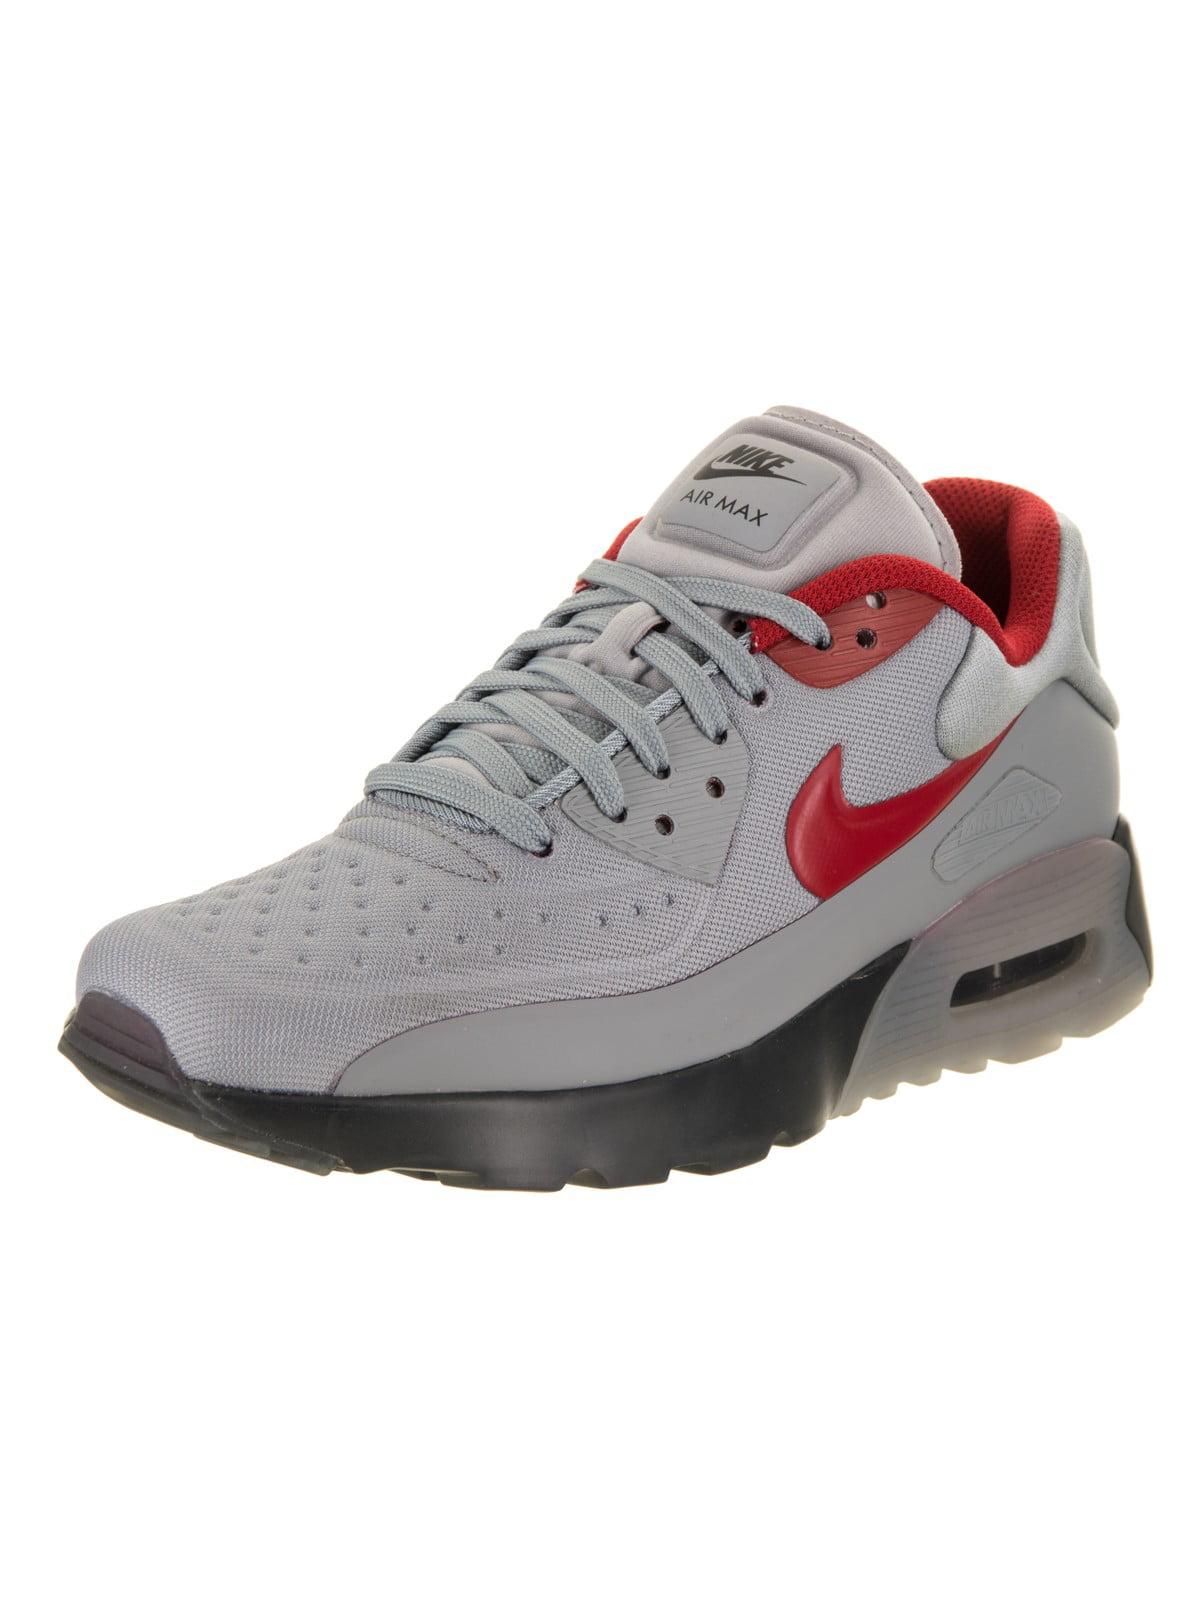 buy popular f9358 97535 Nike Kids Air Max 90 Ultra SE (GS) Running Shoe